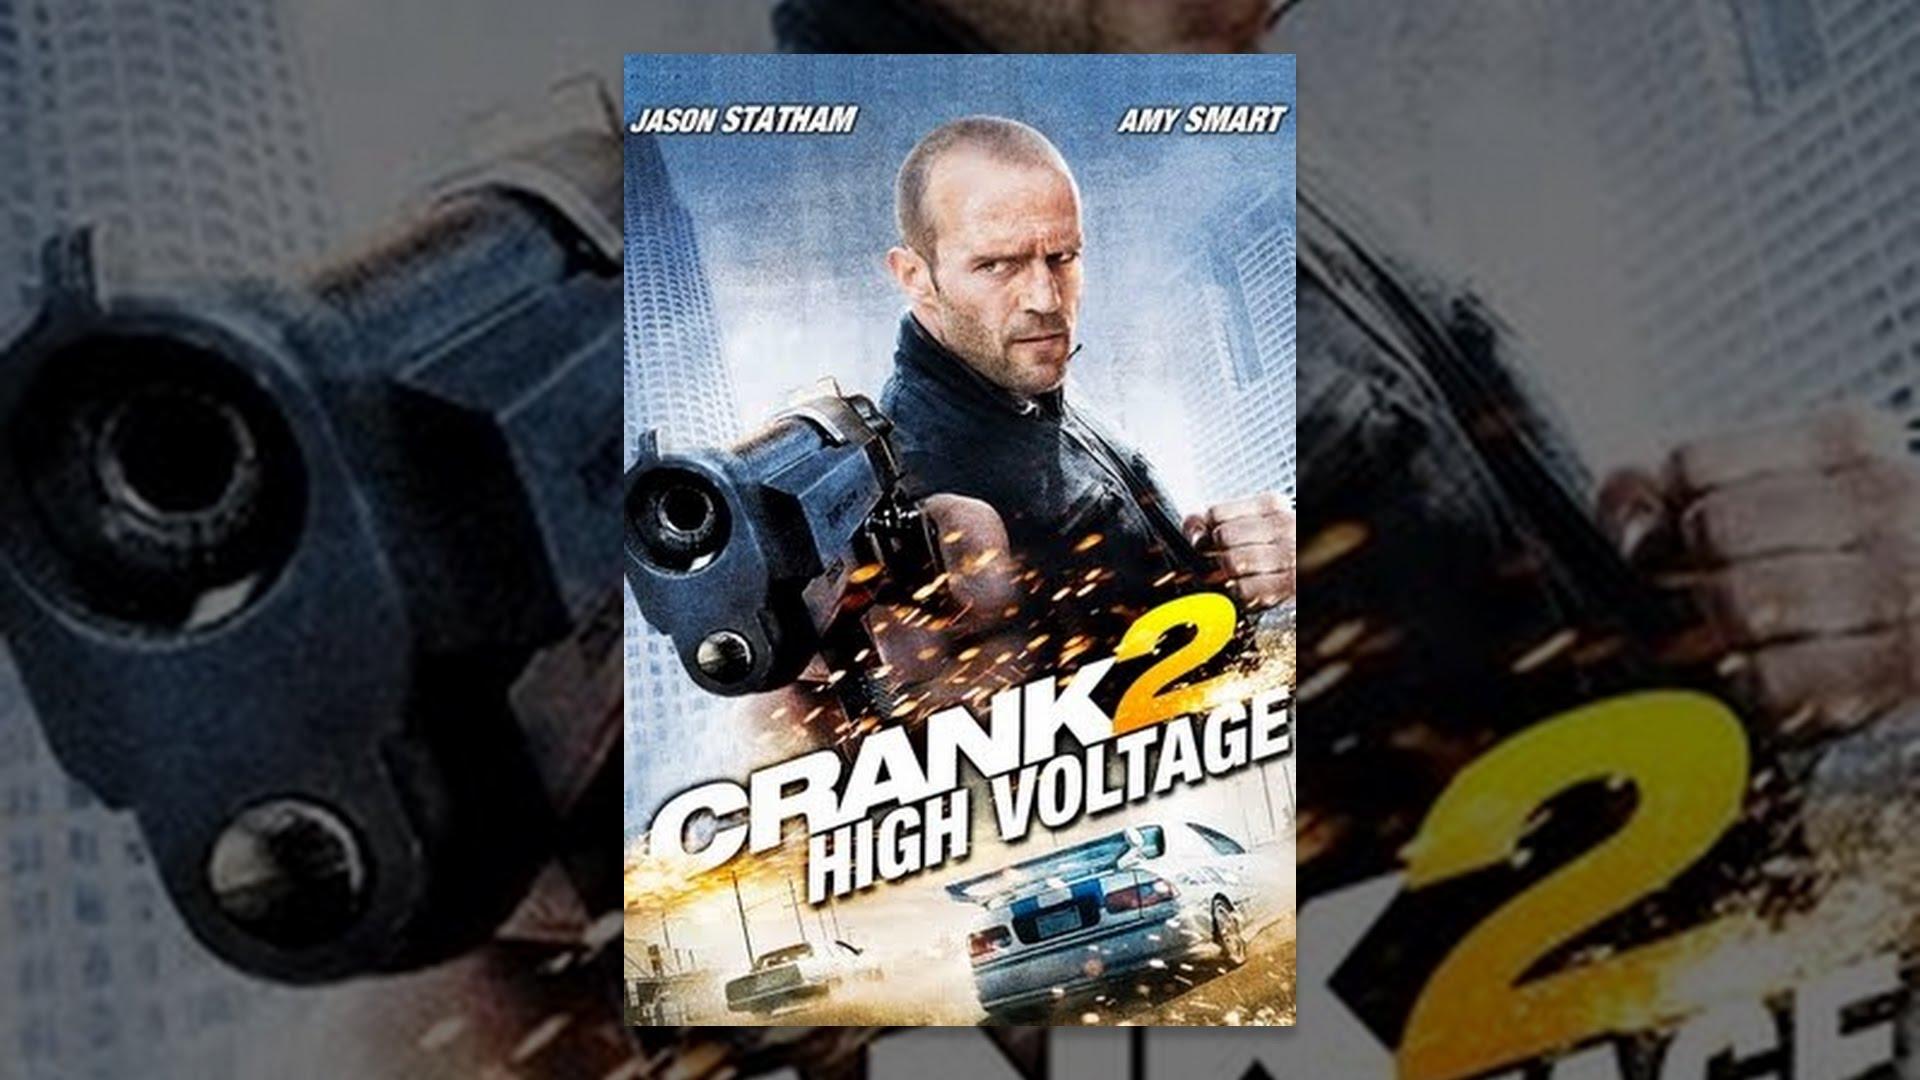 crank 2 high voltage full movie free